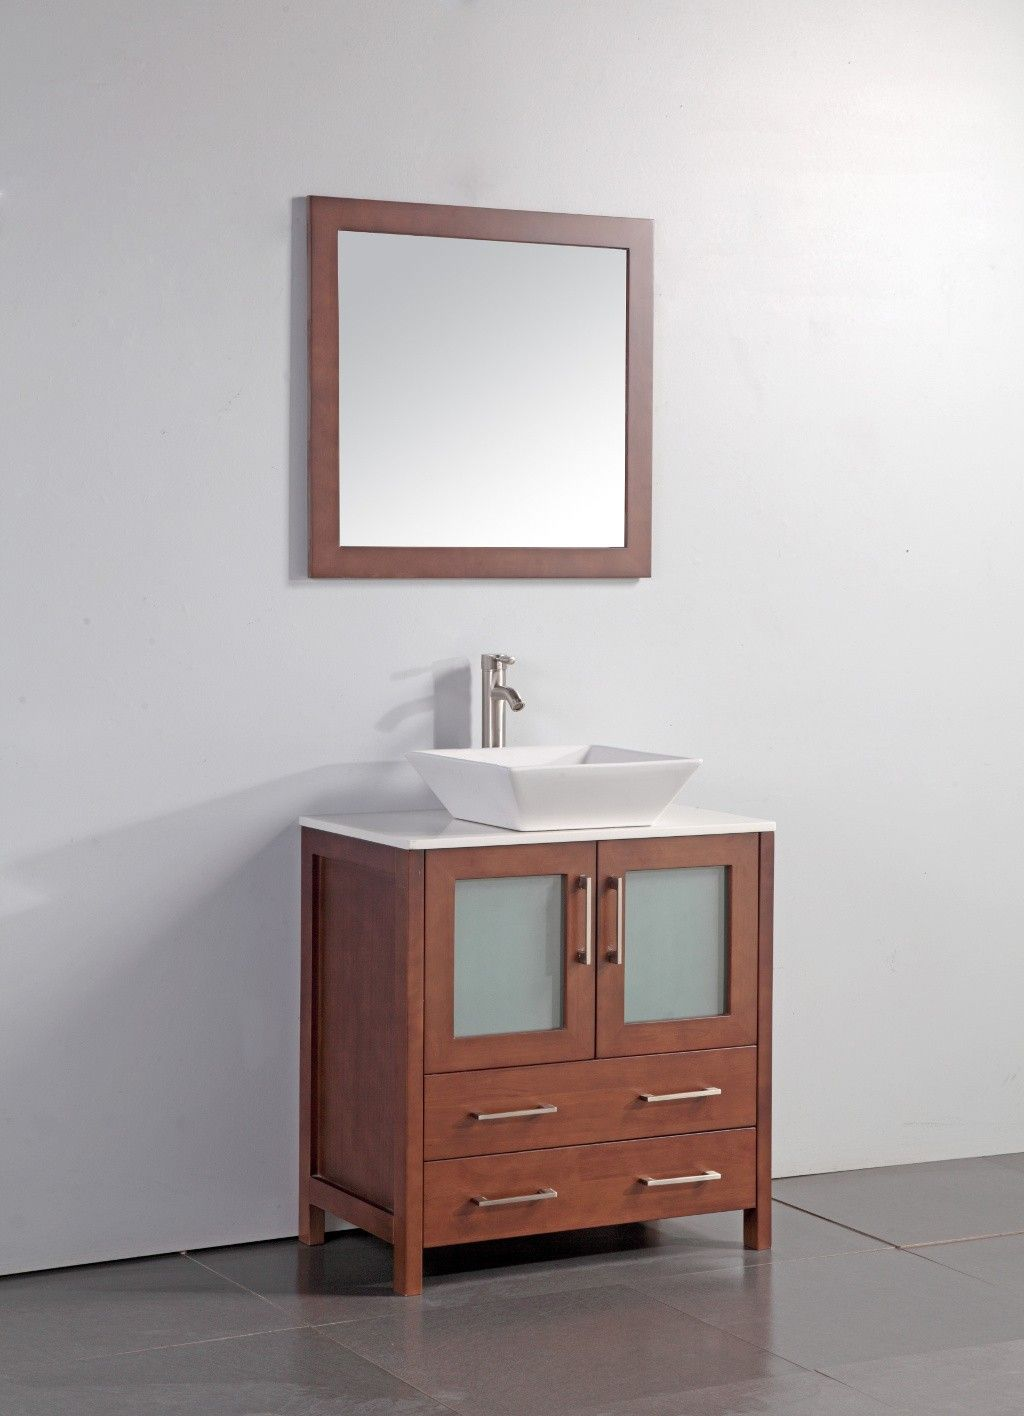 30 Inch Brown Vanity Top Vessel Sink Mirror Wa7830c Bathroom